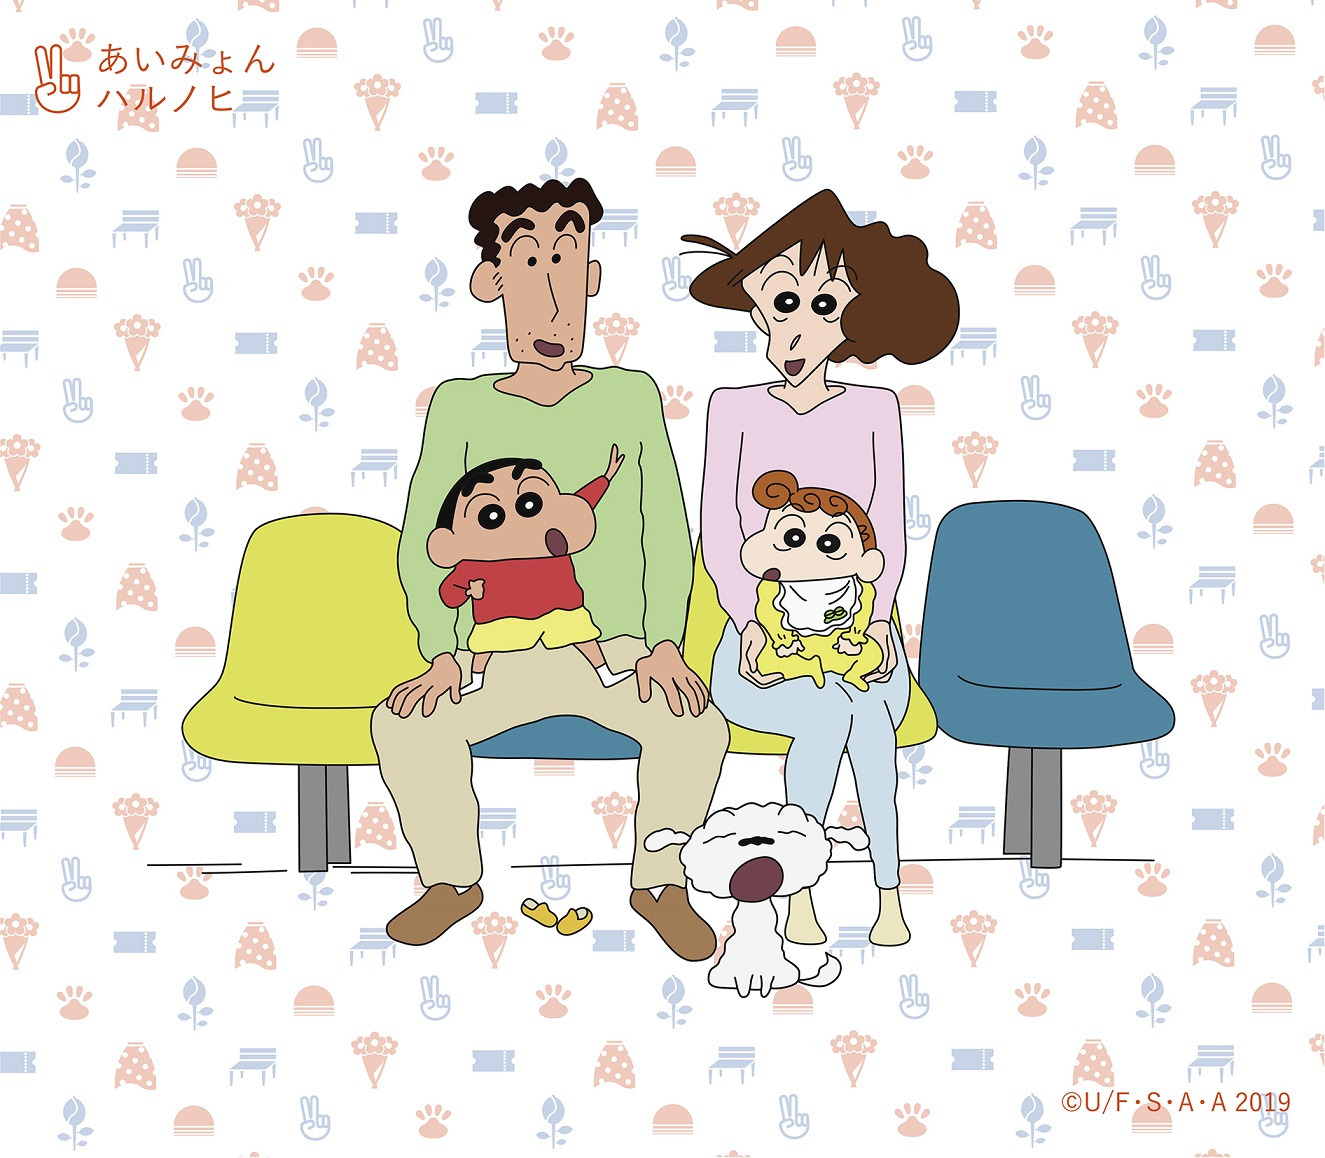 7thシングル ハルノヒ アートワーク公開 視聴movie公開 あい